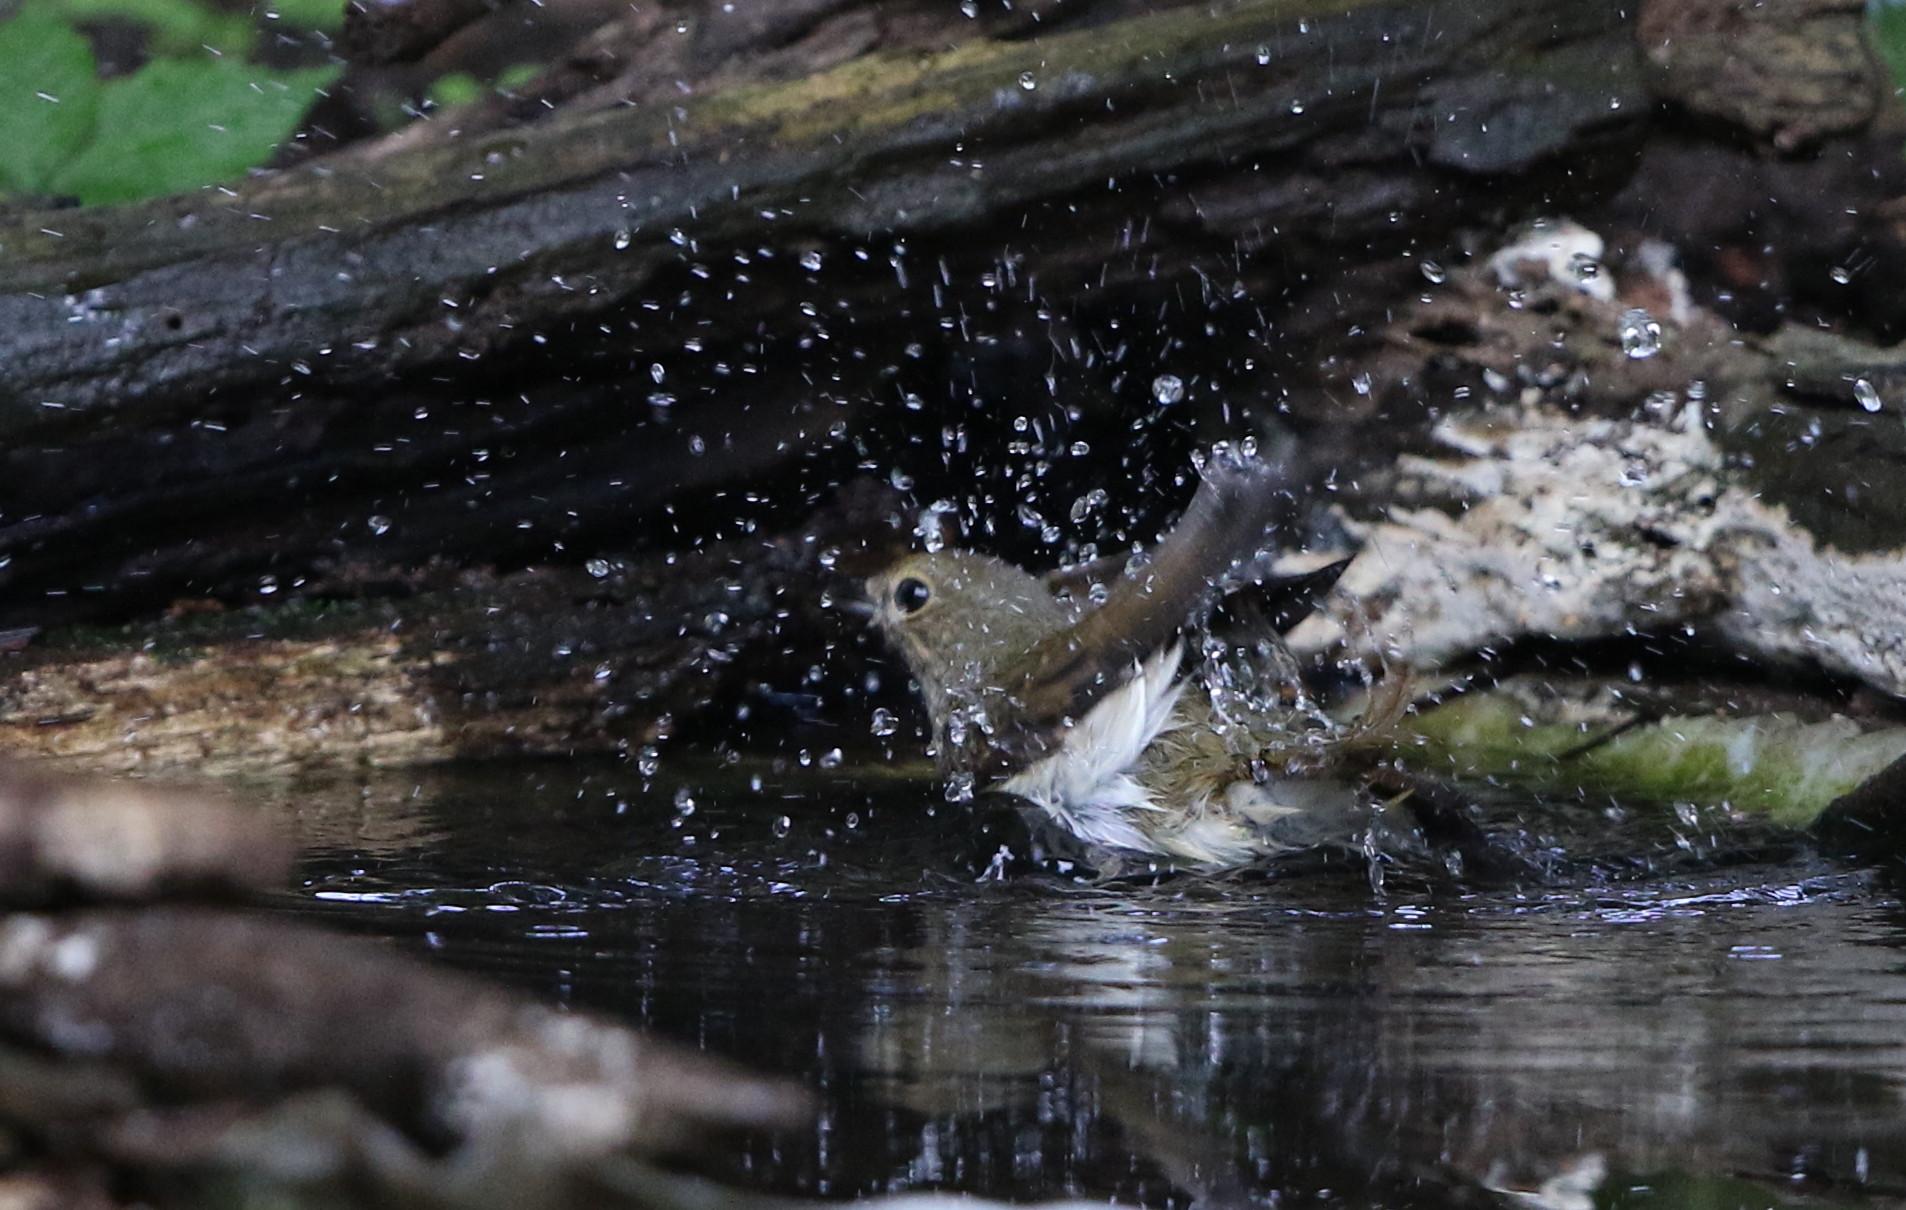 MFの森の水場キビタキ雌(水浴び)_f0239515_16452433.jpg